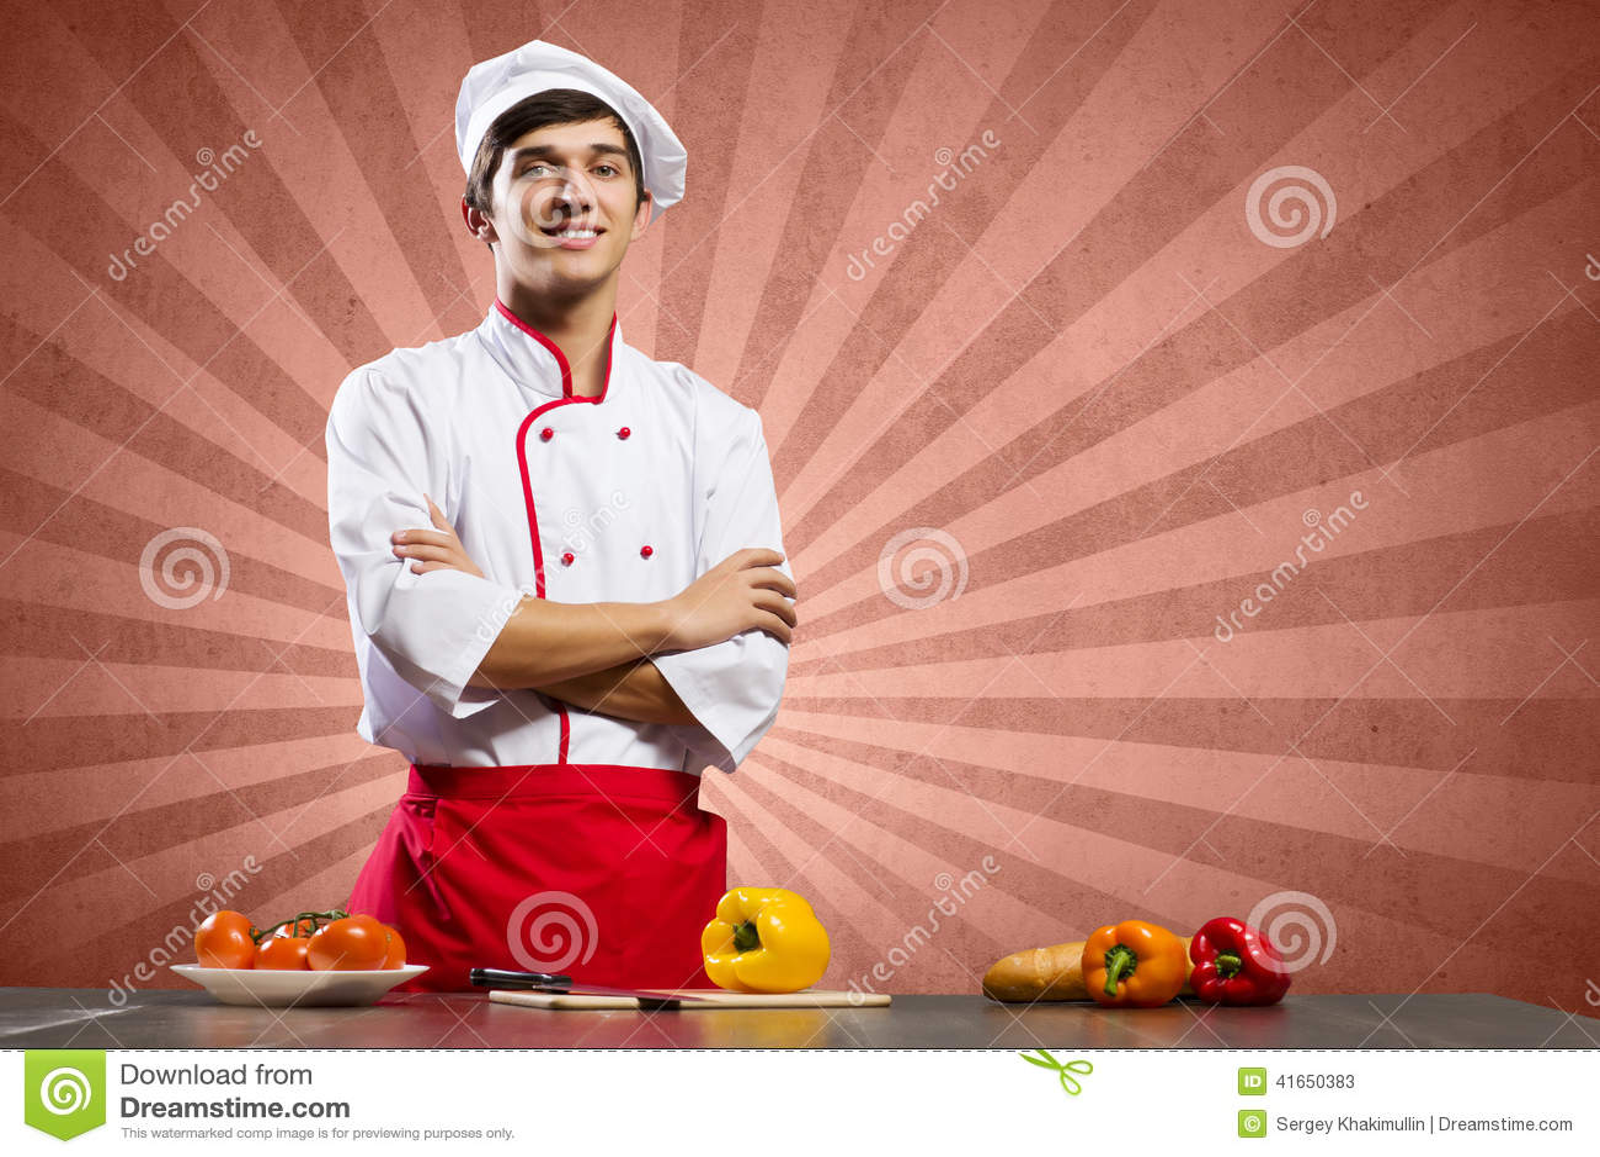 Кашевар на кухне